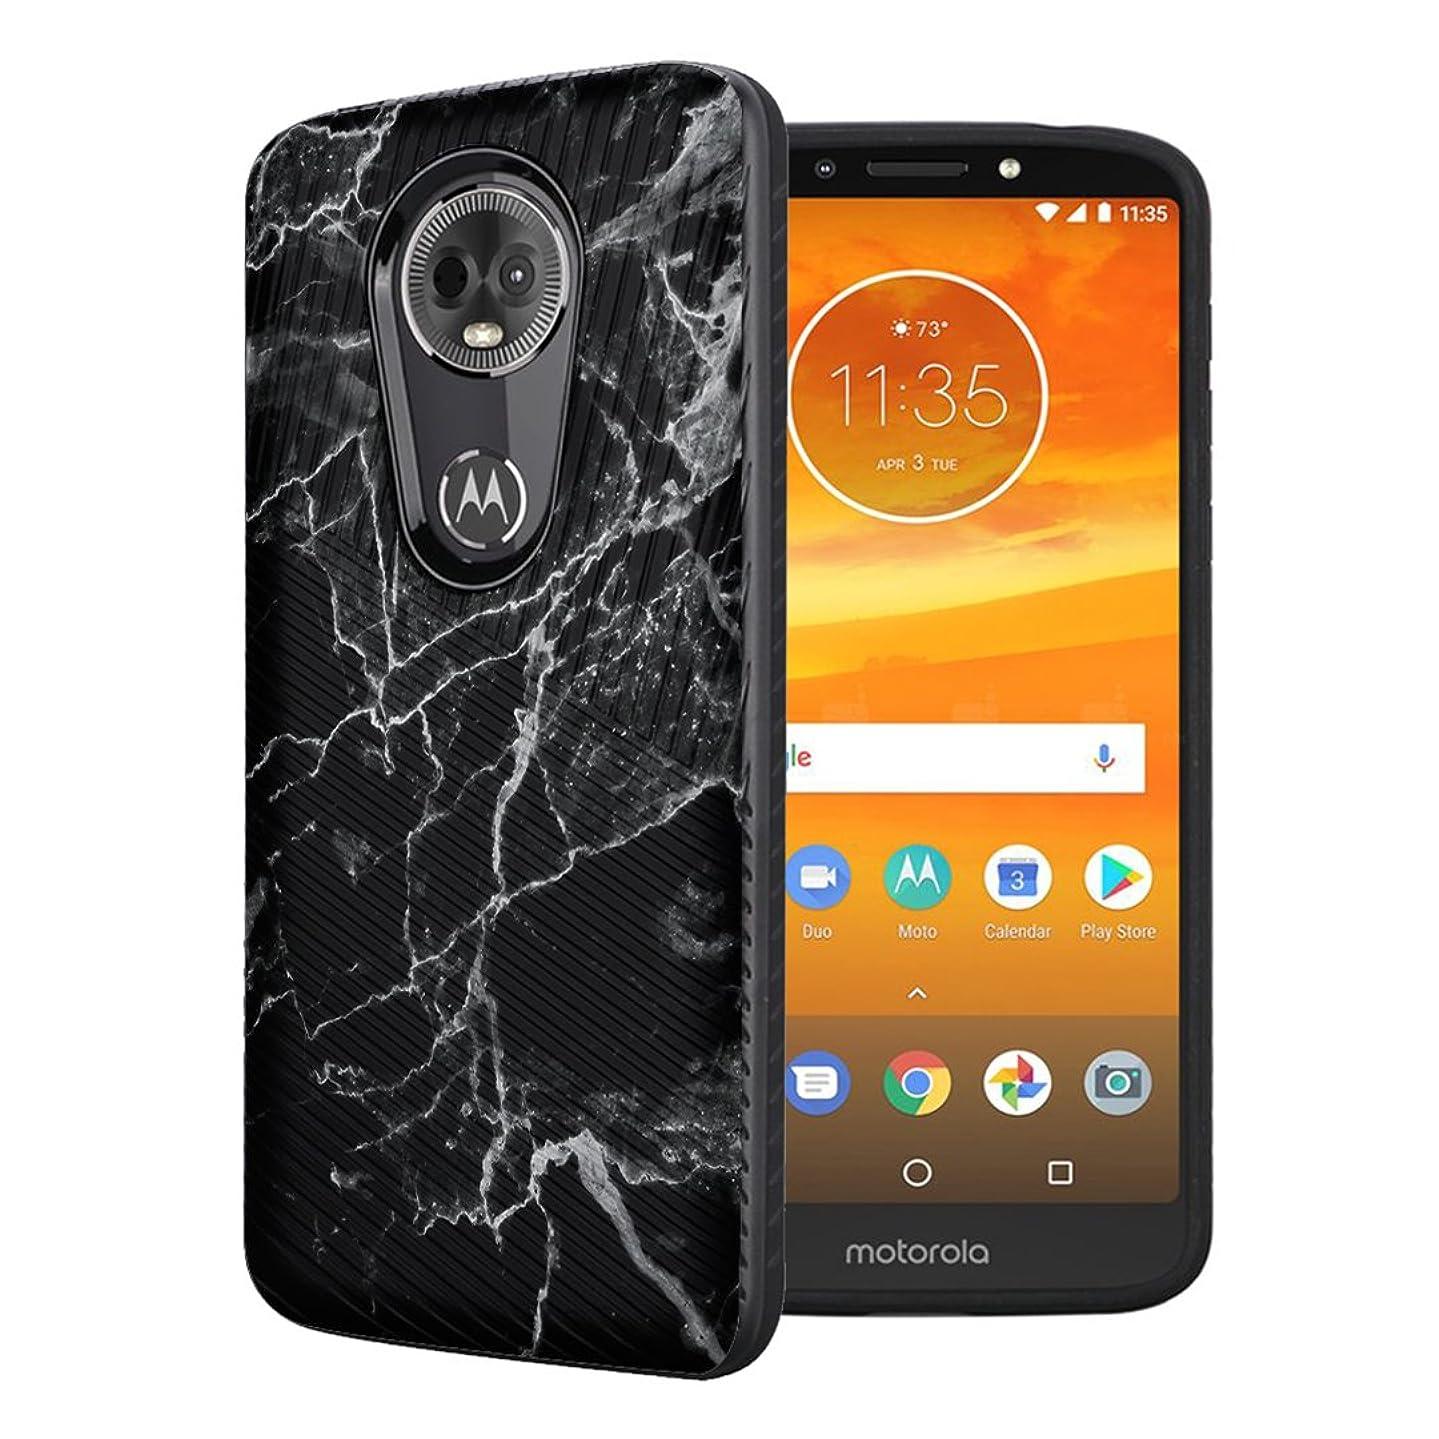 Moriko Case Compatible with Moto G7 Power, Moto G7 Supra [Embossed Diagonal Lines Hybrid Slim Armor Black Case] for Motorola Moto G7 Power - (Black Marble Print)